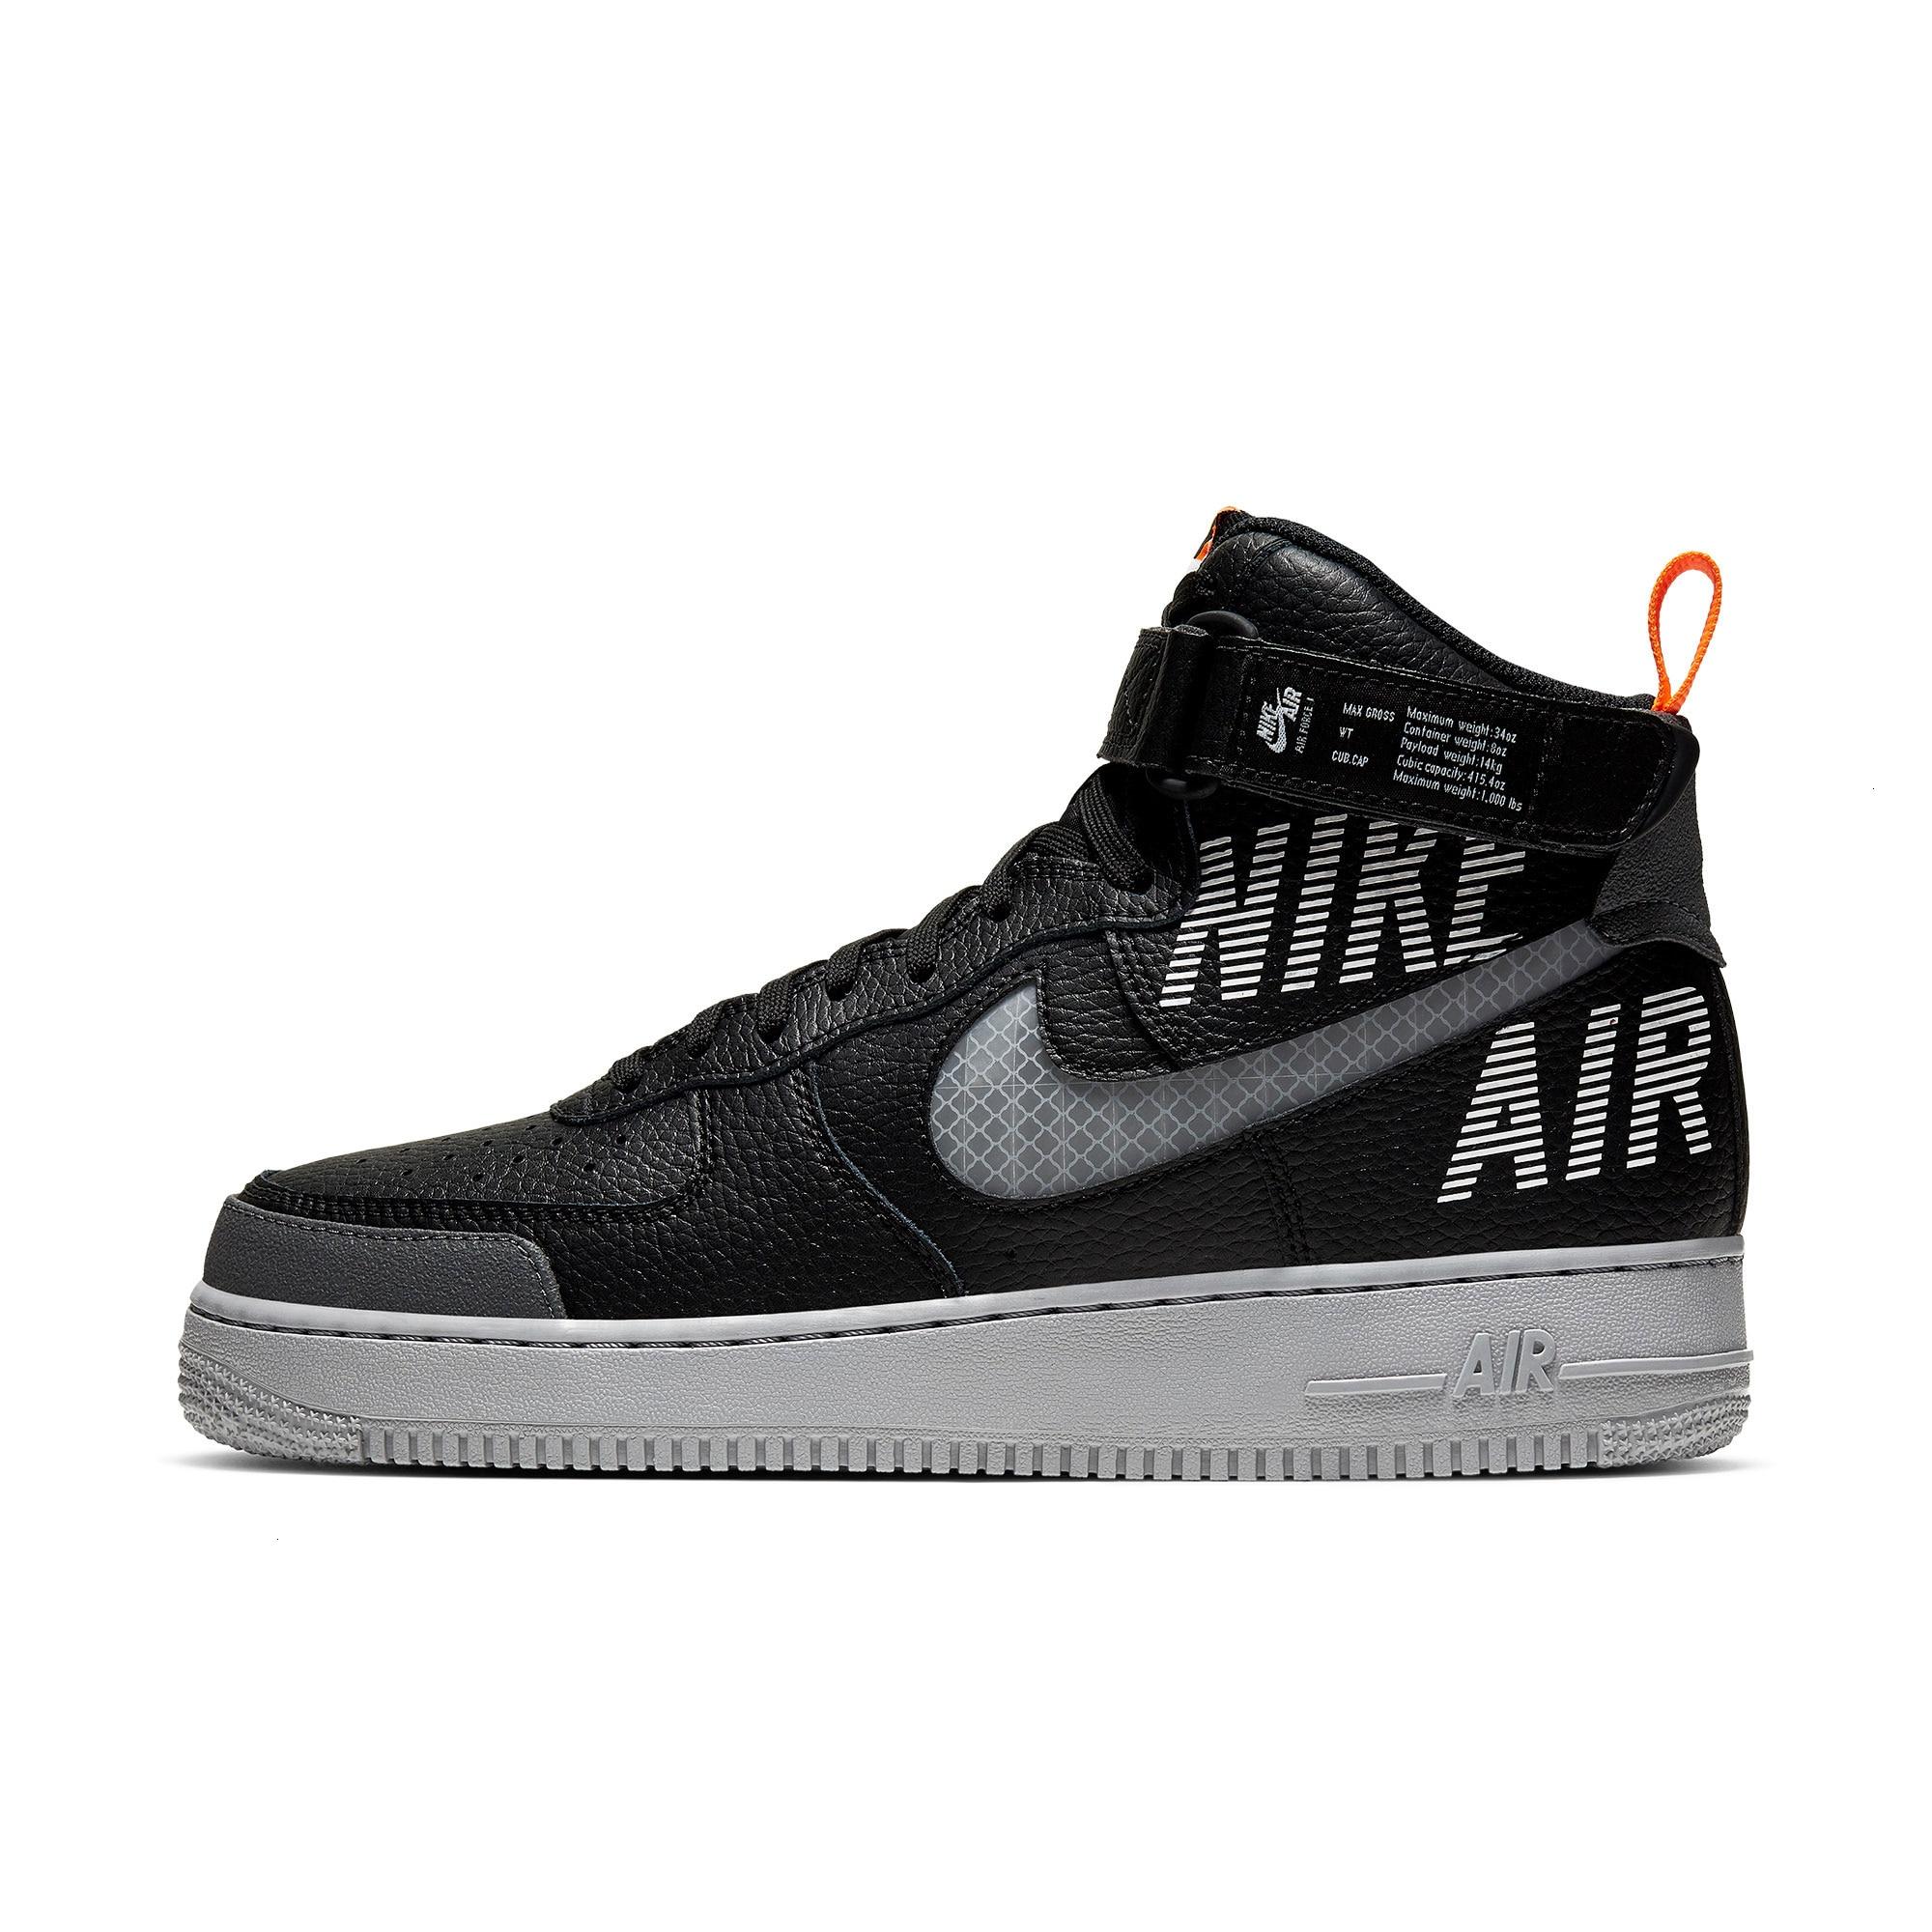 nike air force 1 high 07 white and black